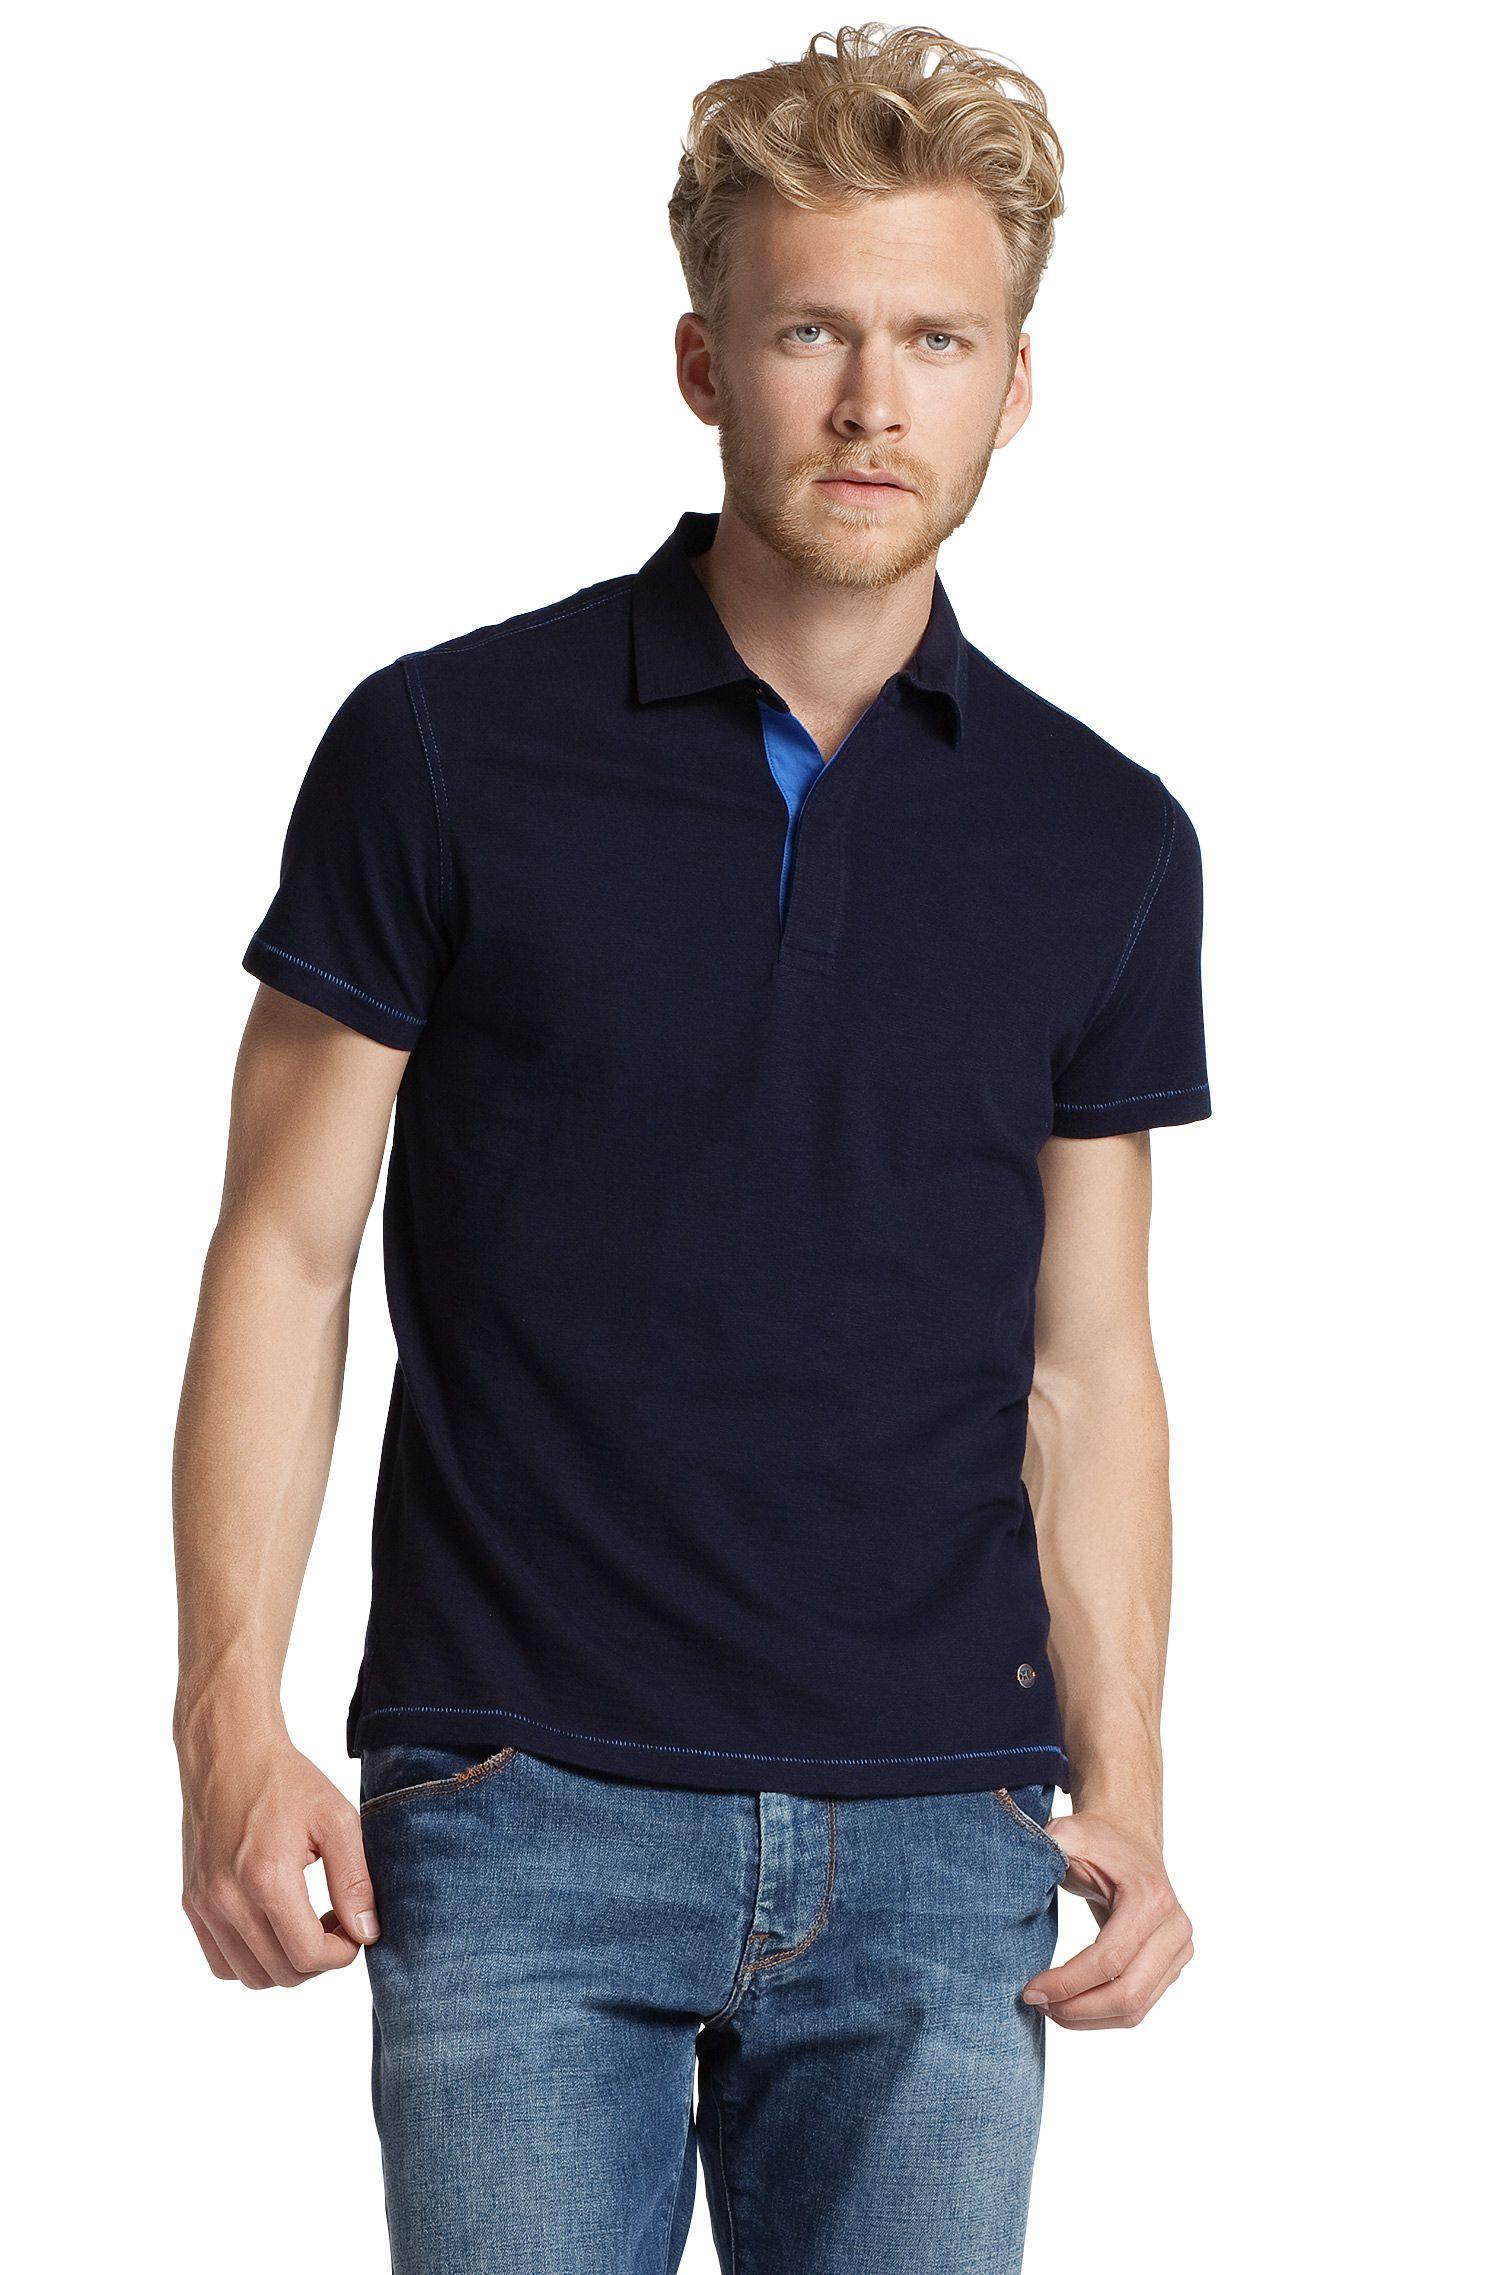 Poloshirt ´Paisley` aus Jersey-Baumwolle